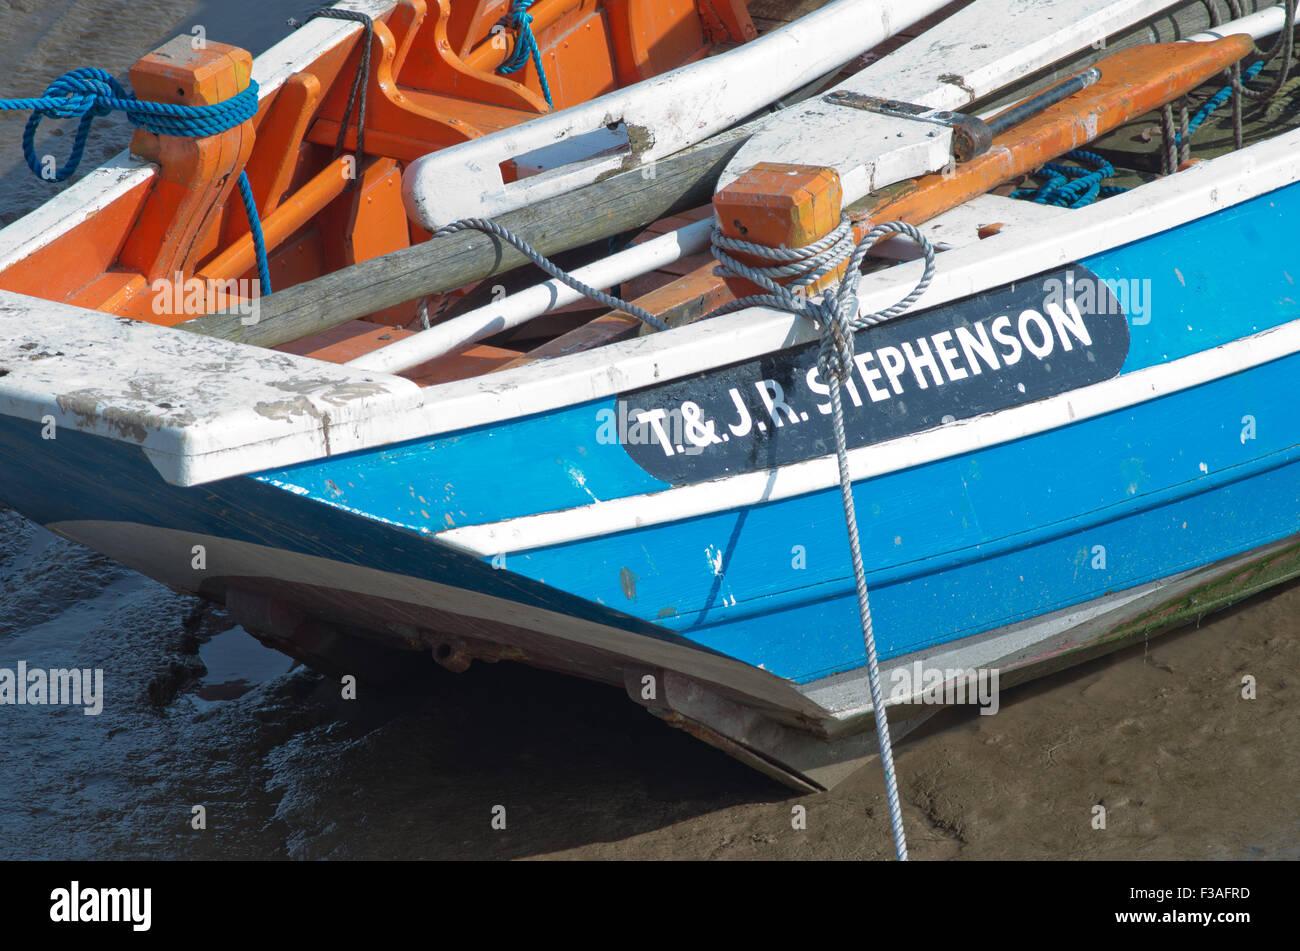 T & JR Stephenson Fishing boat Bridlington Harbour UK Stock Photo